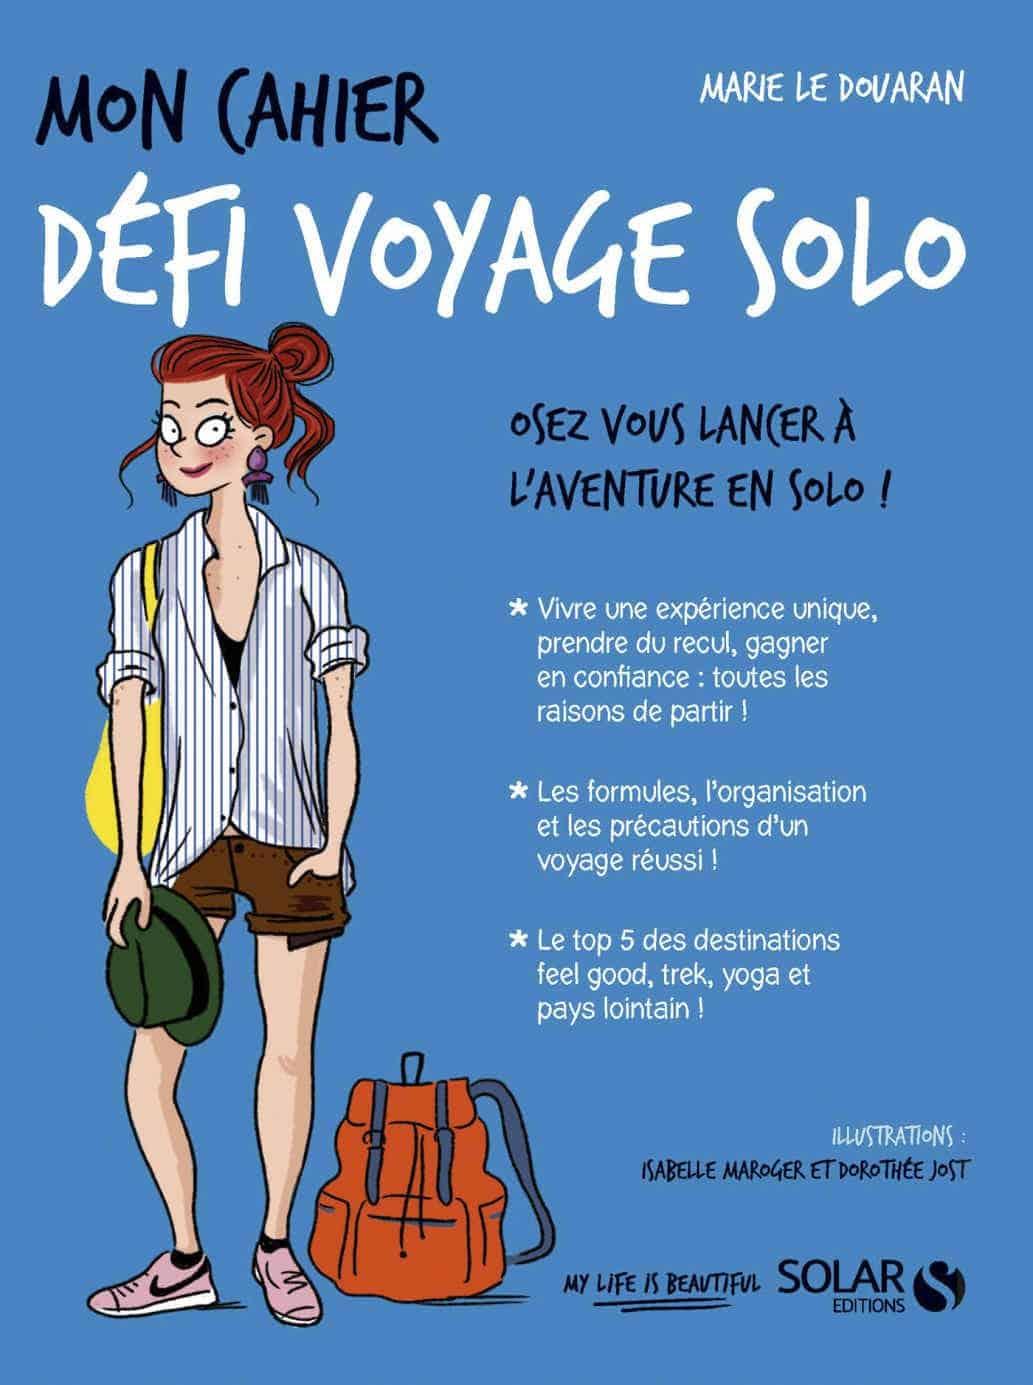 Mon cahier Défi voyage solo, de Marie Le Douaran